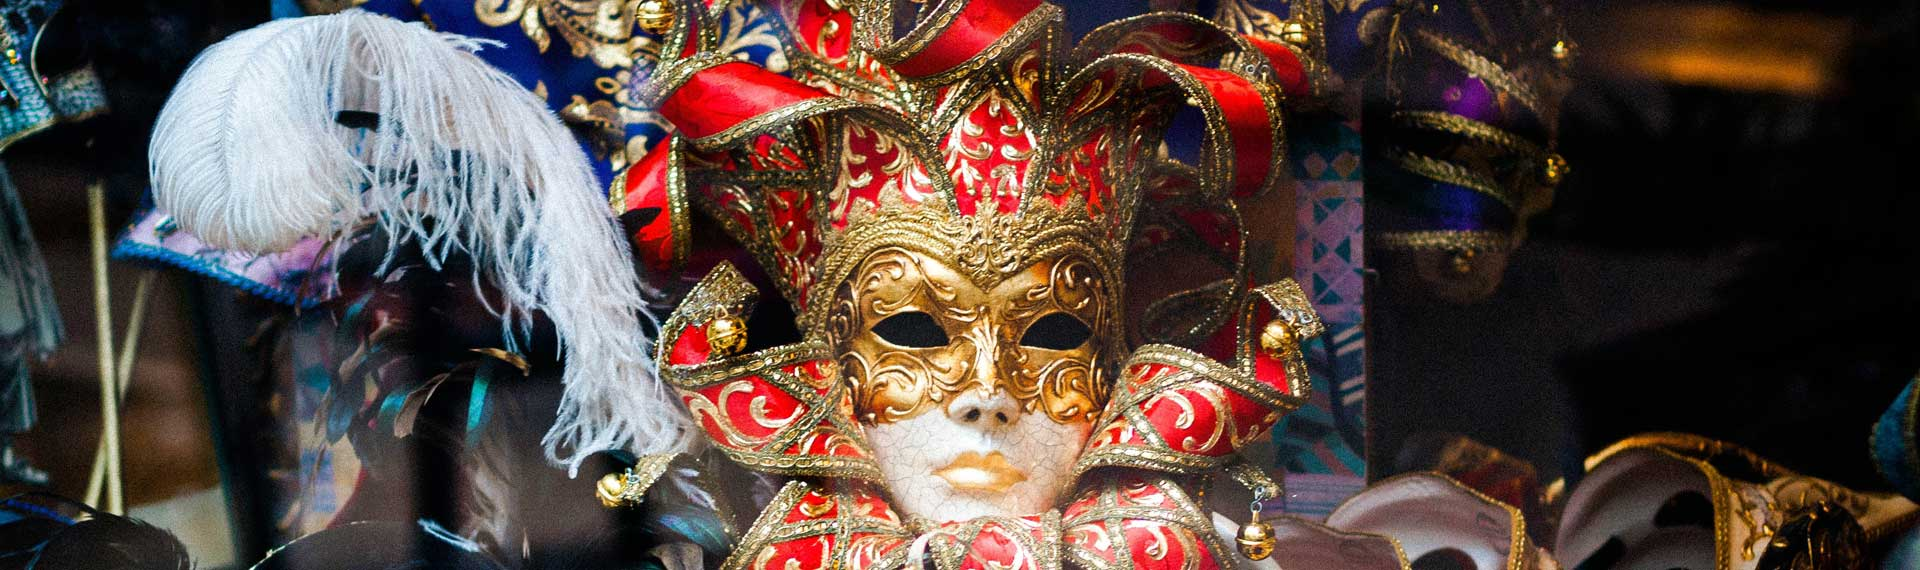 slider_karneval